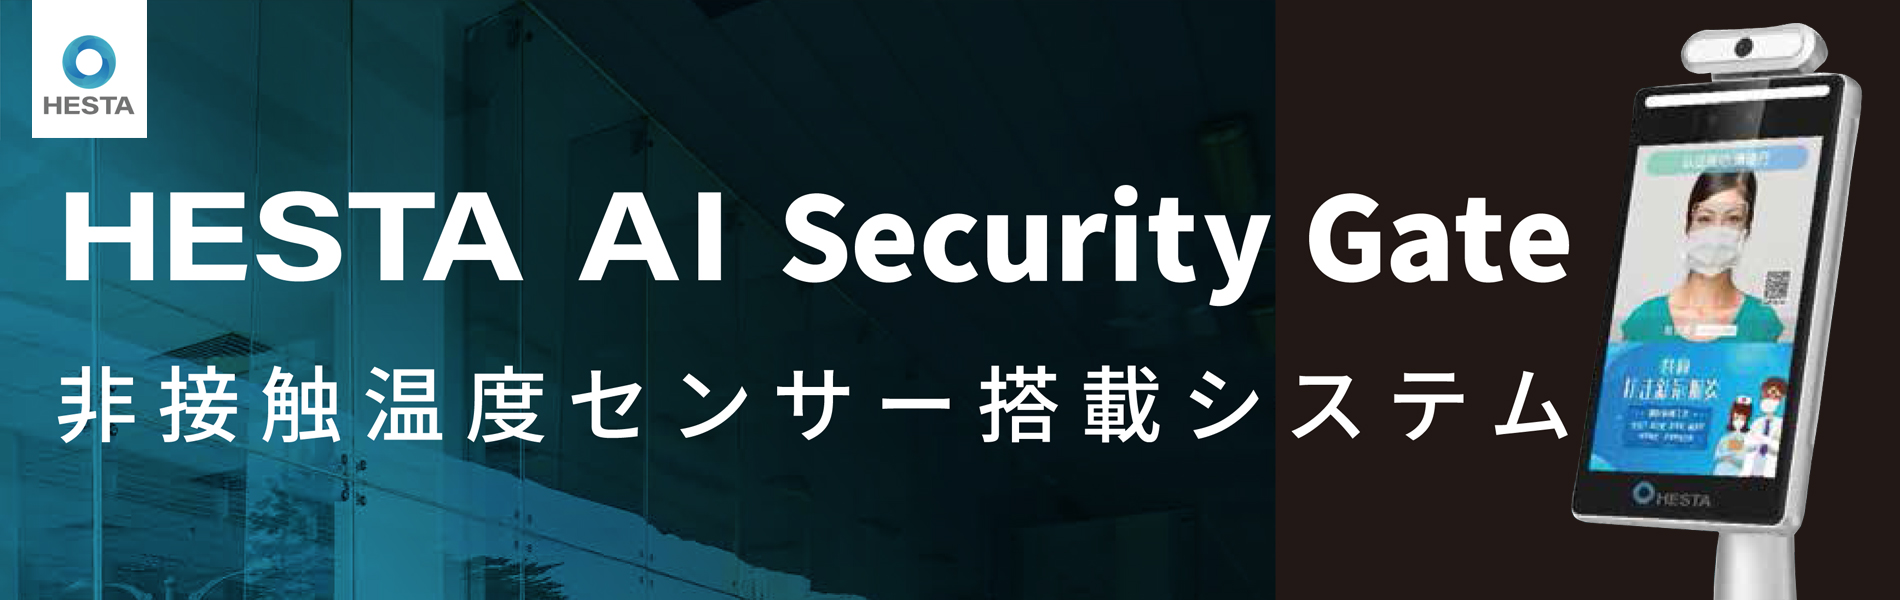 HESTA AI Security Gage